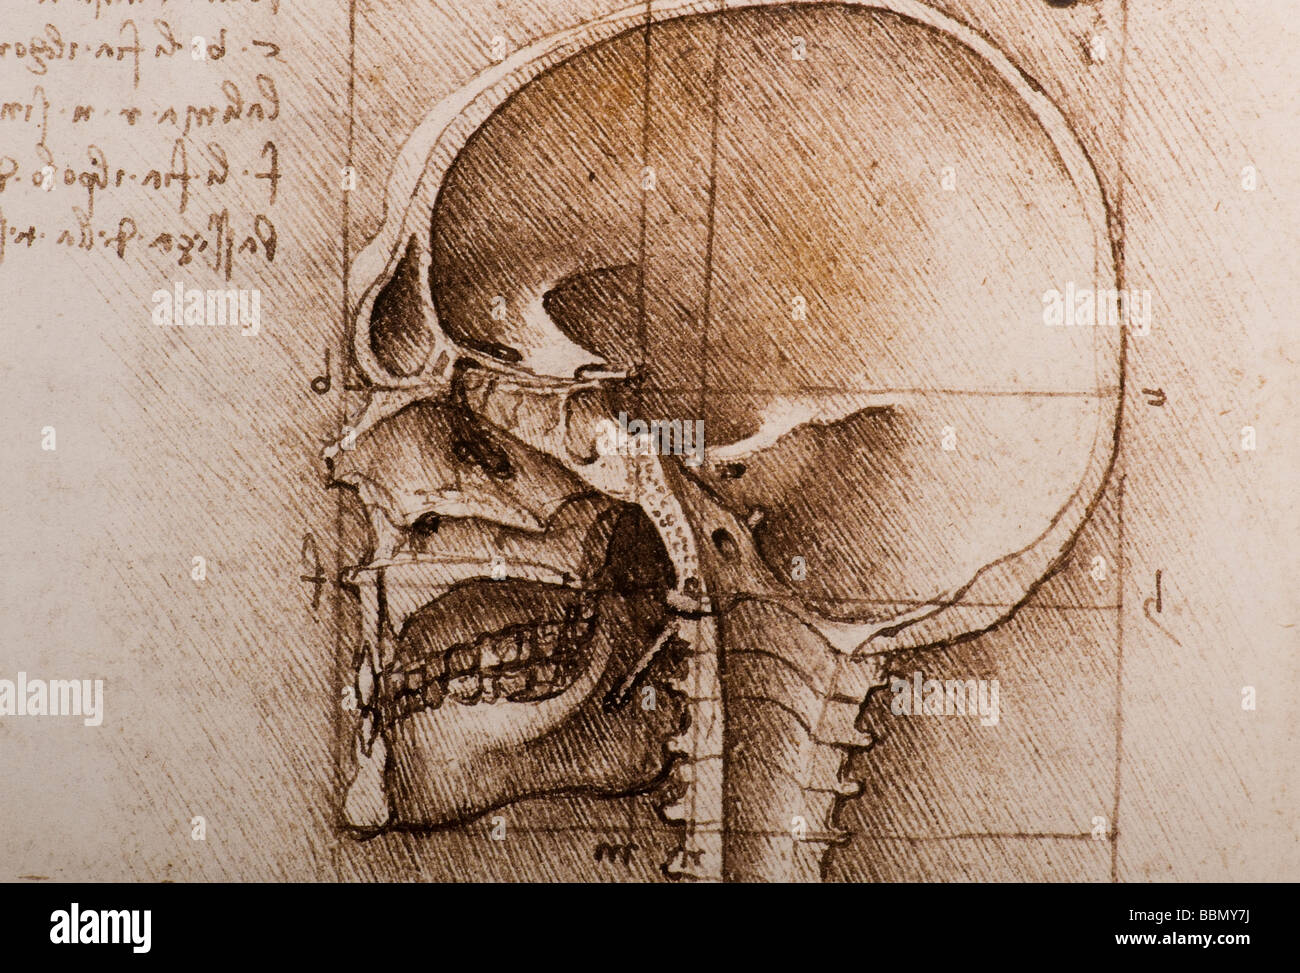 detail Anatomical studies of the human skull by Leonardo da Vinci ...